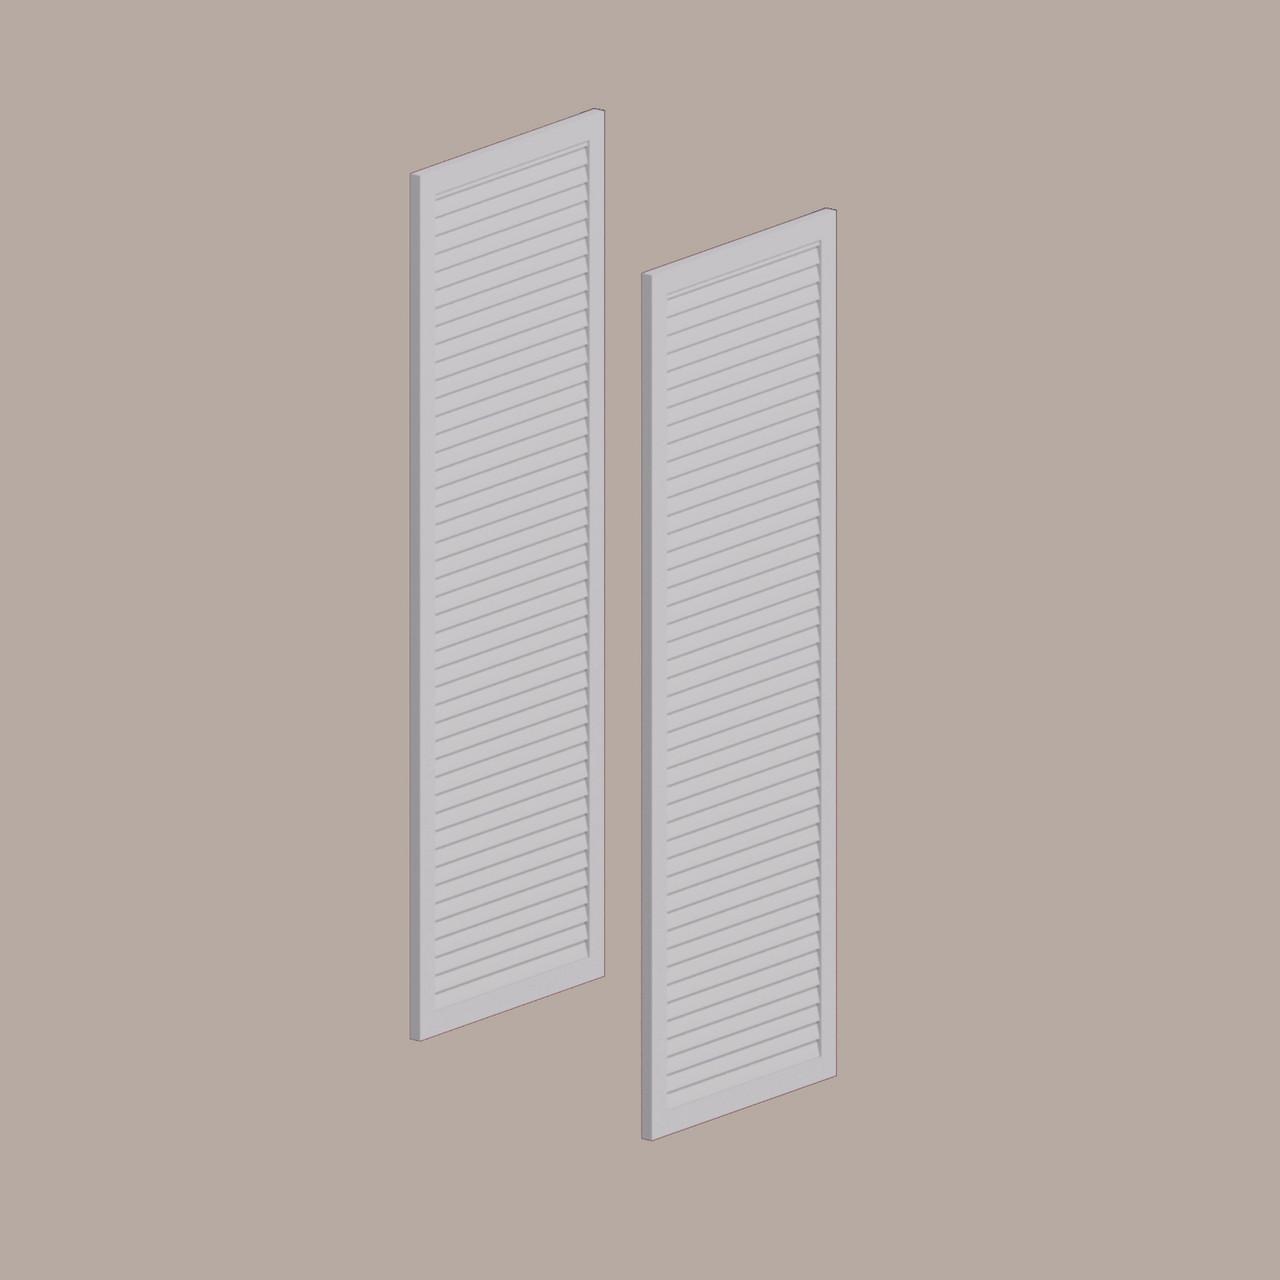 Fypon shutter___LVSH12X60FNB___X LOUVERED SHUTTER, 12 W X 60 H X 1 P FINE SLATS